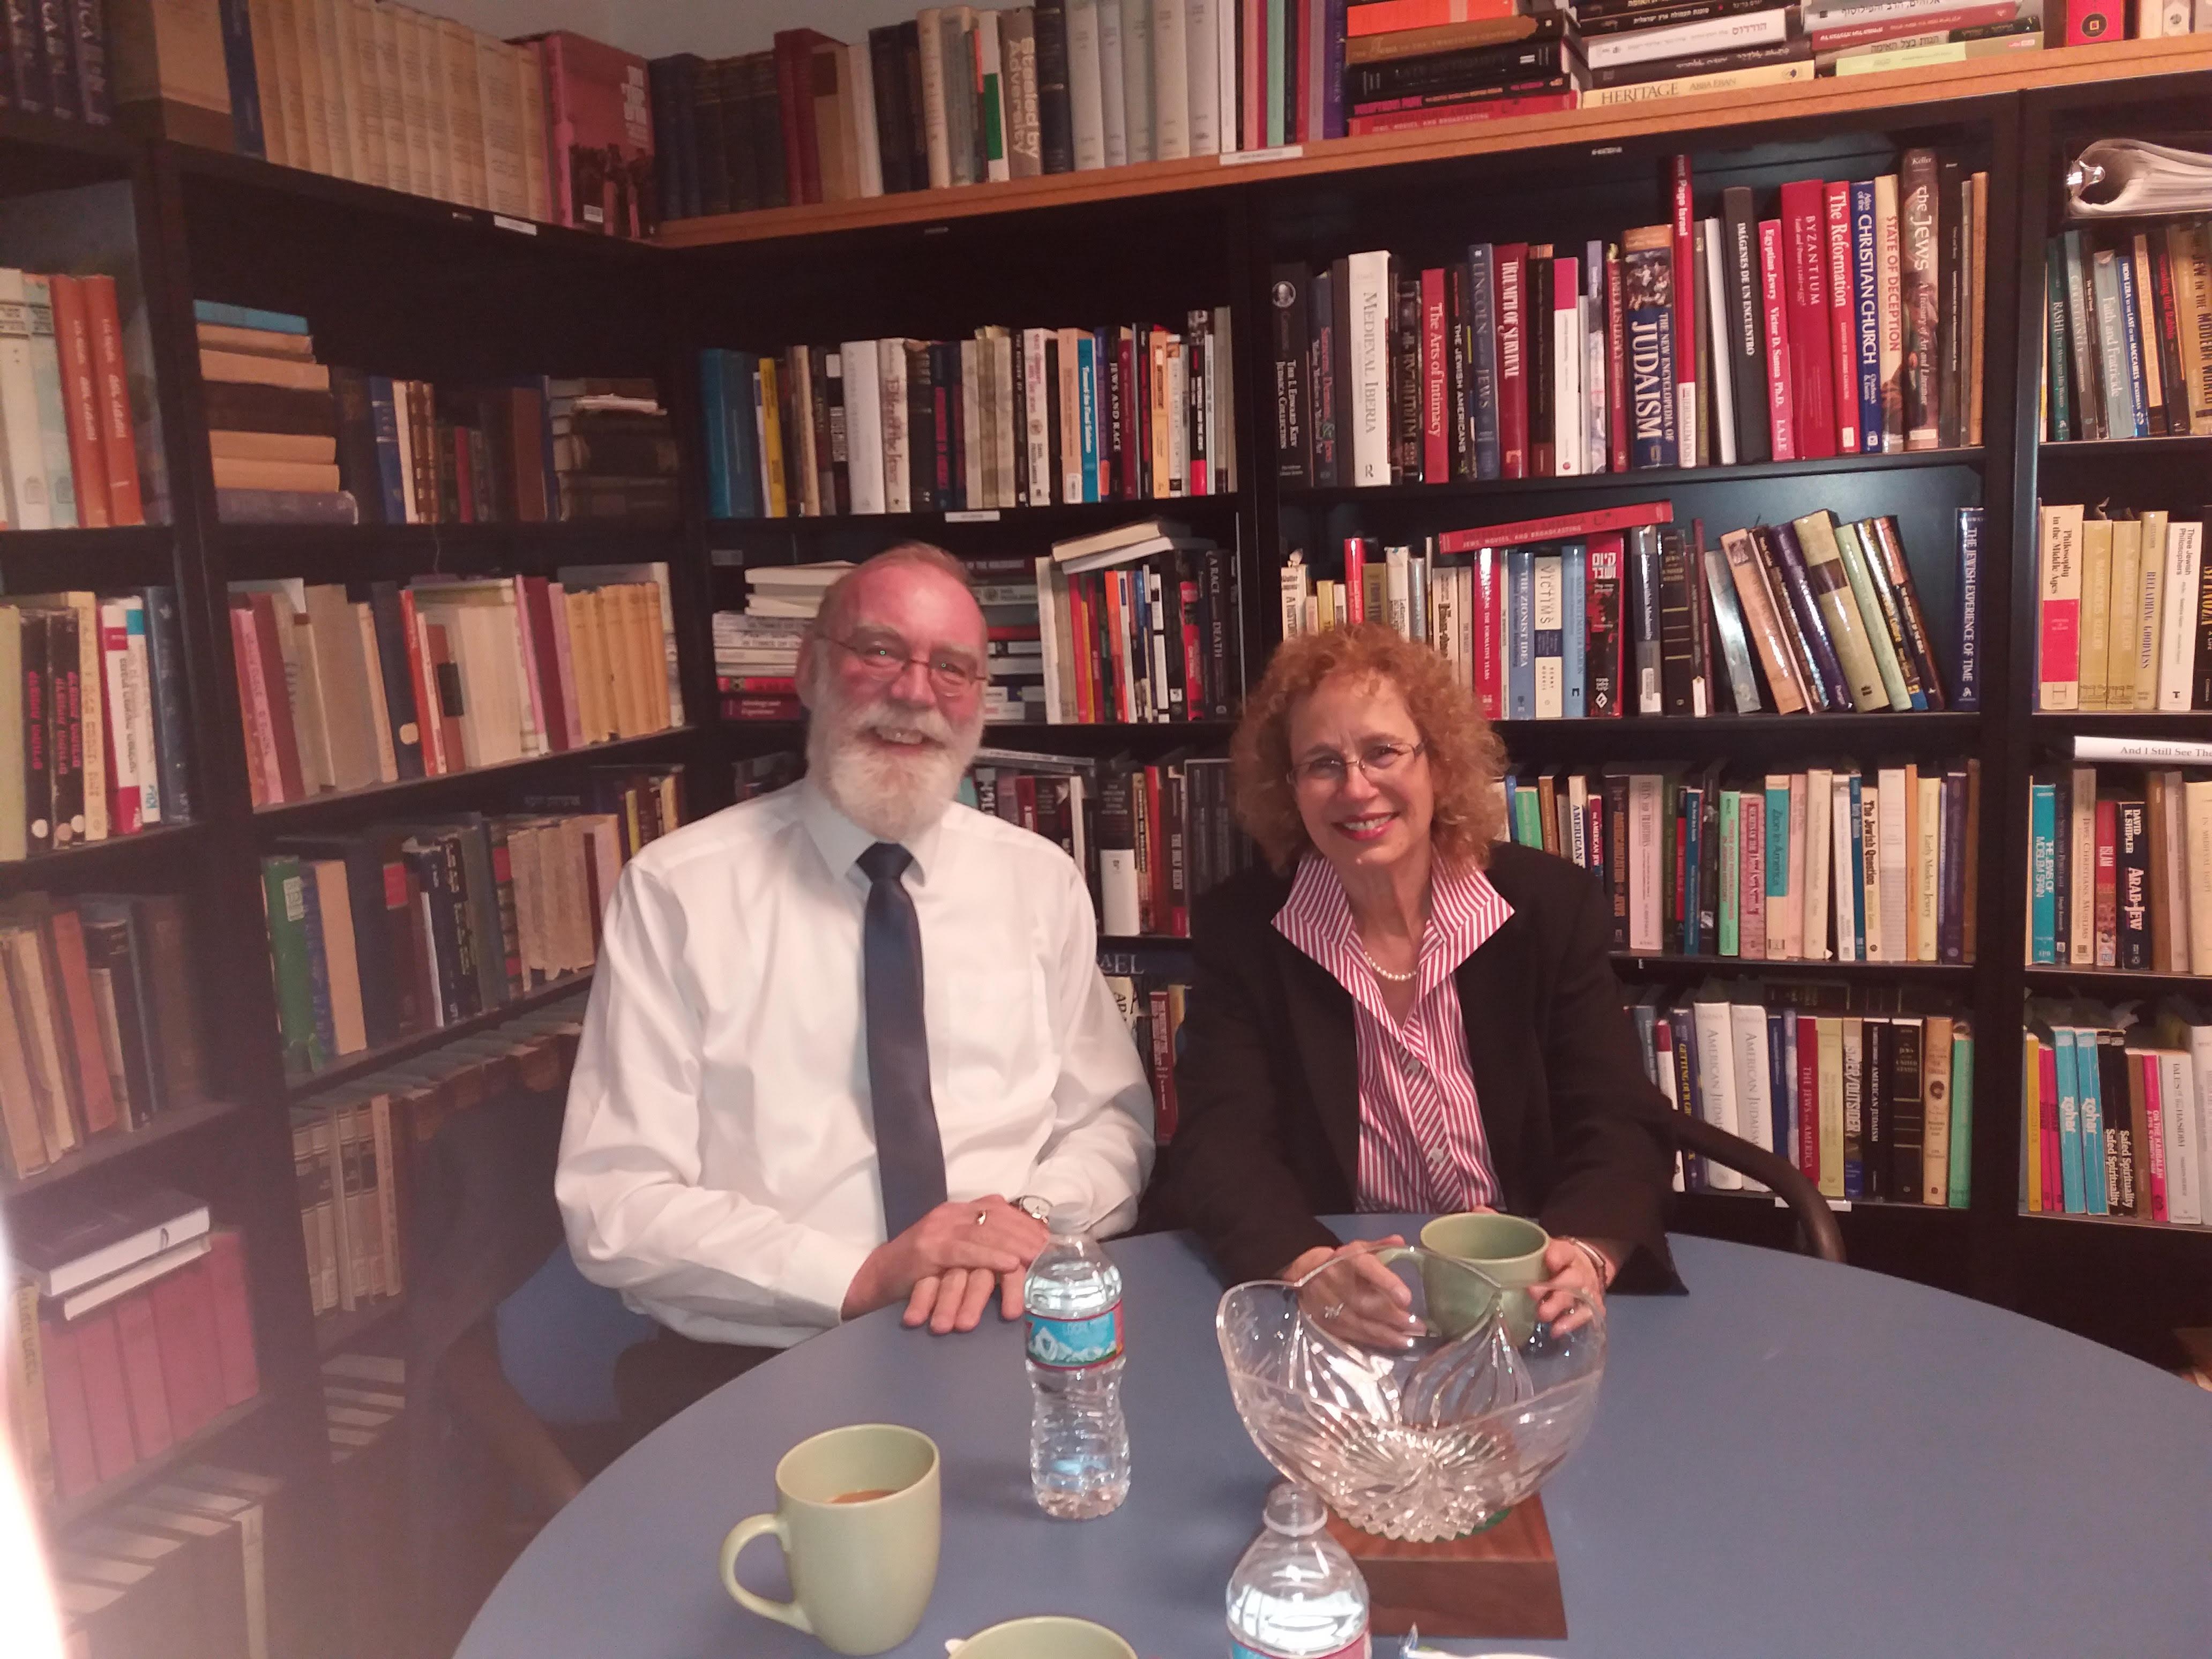 With Prof. Hava Tirosh